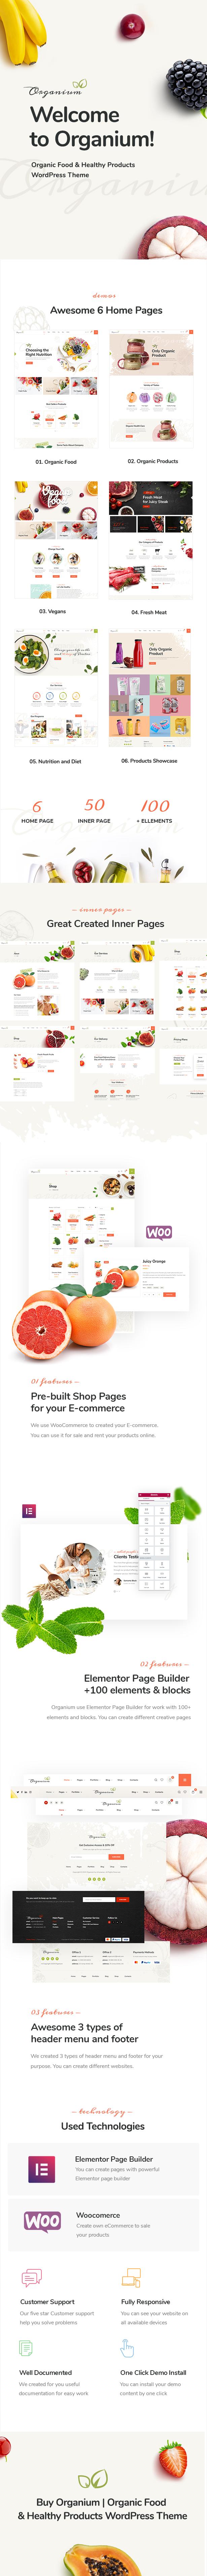 Organium | Organic Food Products WordPress Theme - 1